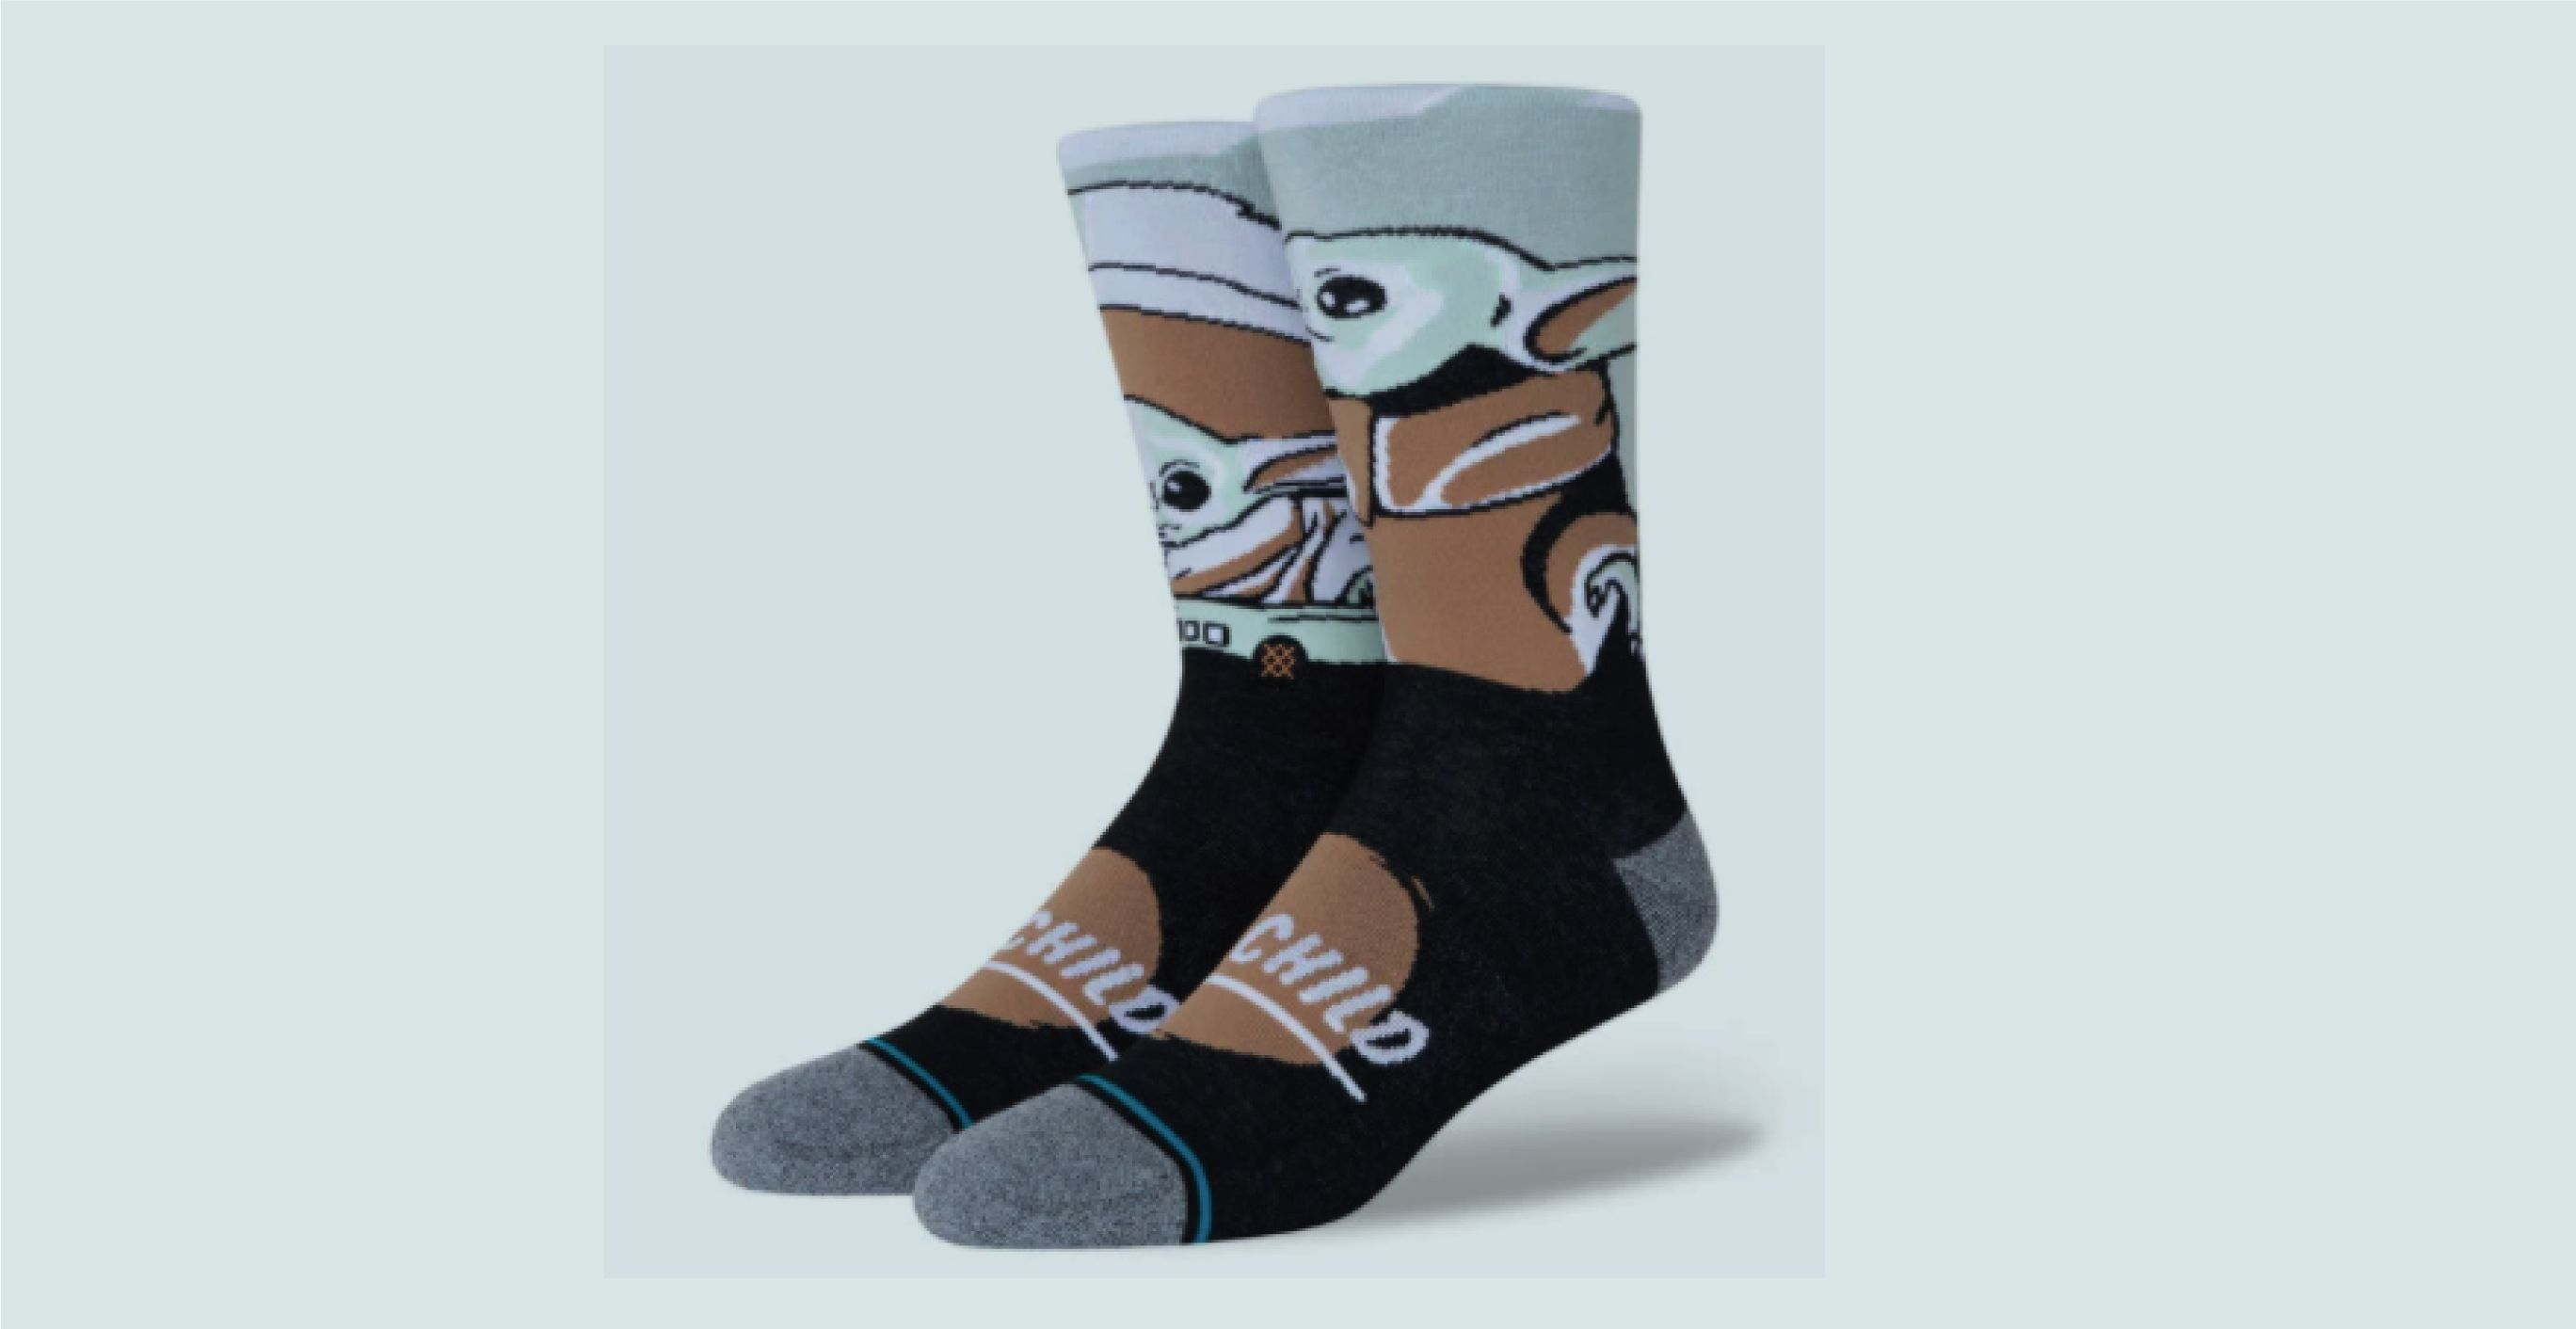 The Child Socks